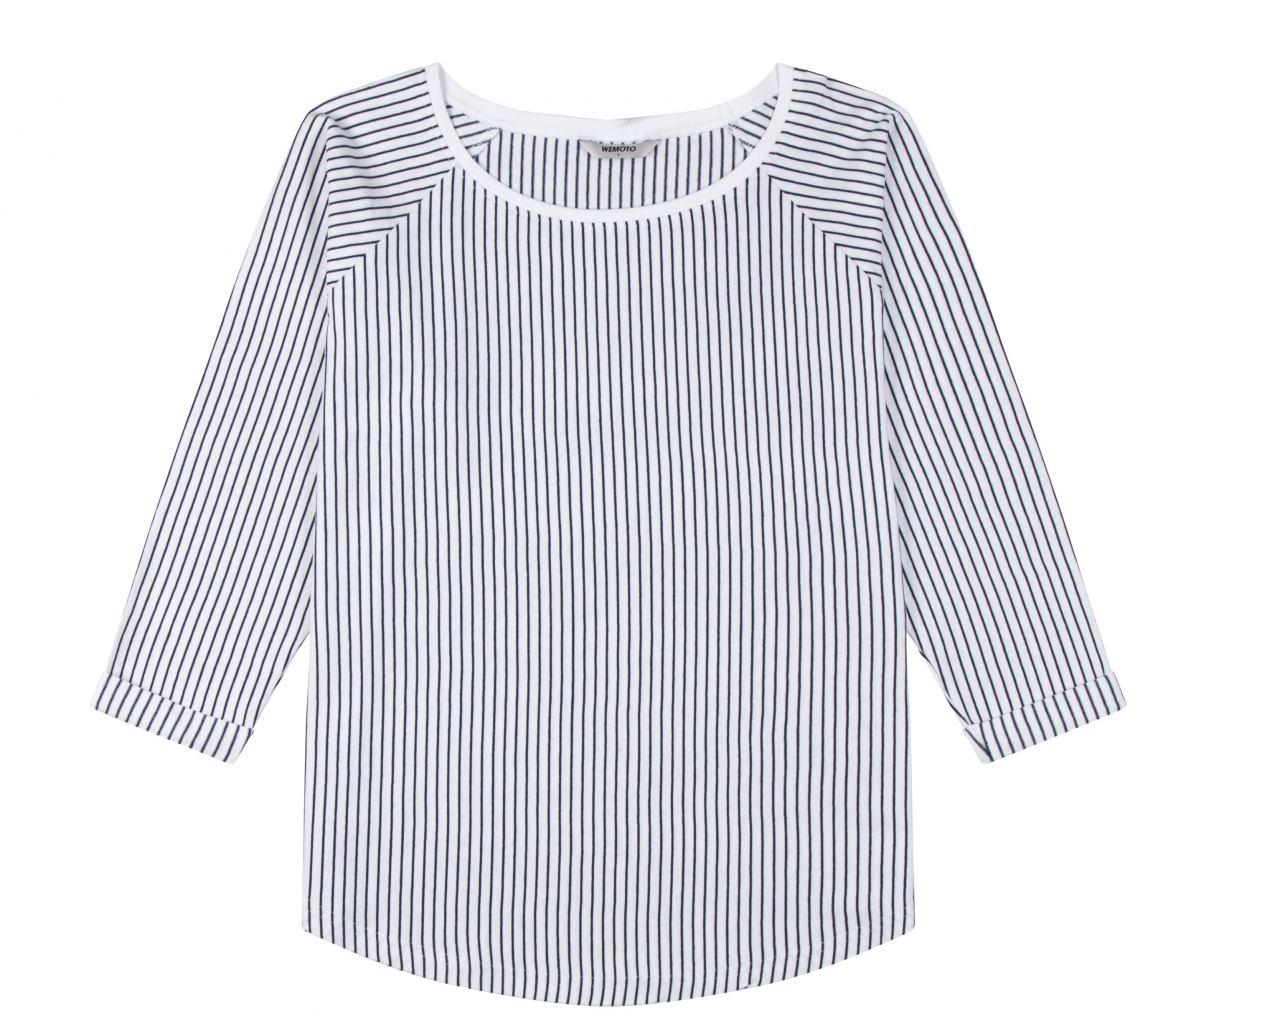 Shane Striped Shirt White Navy Blue